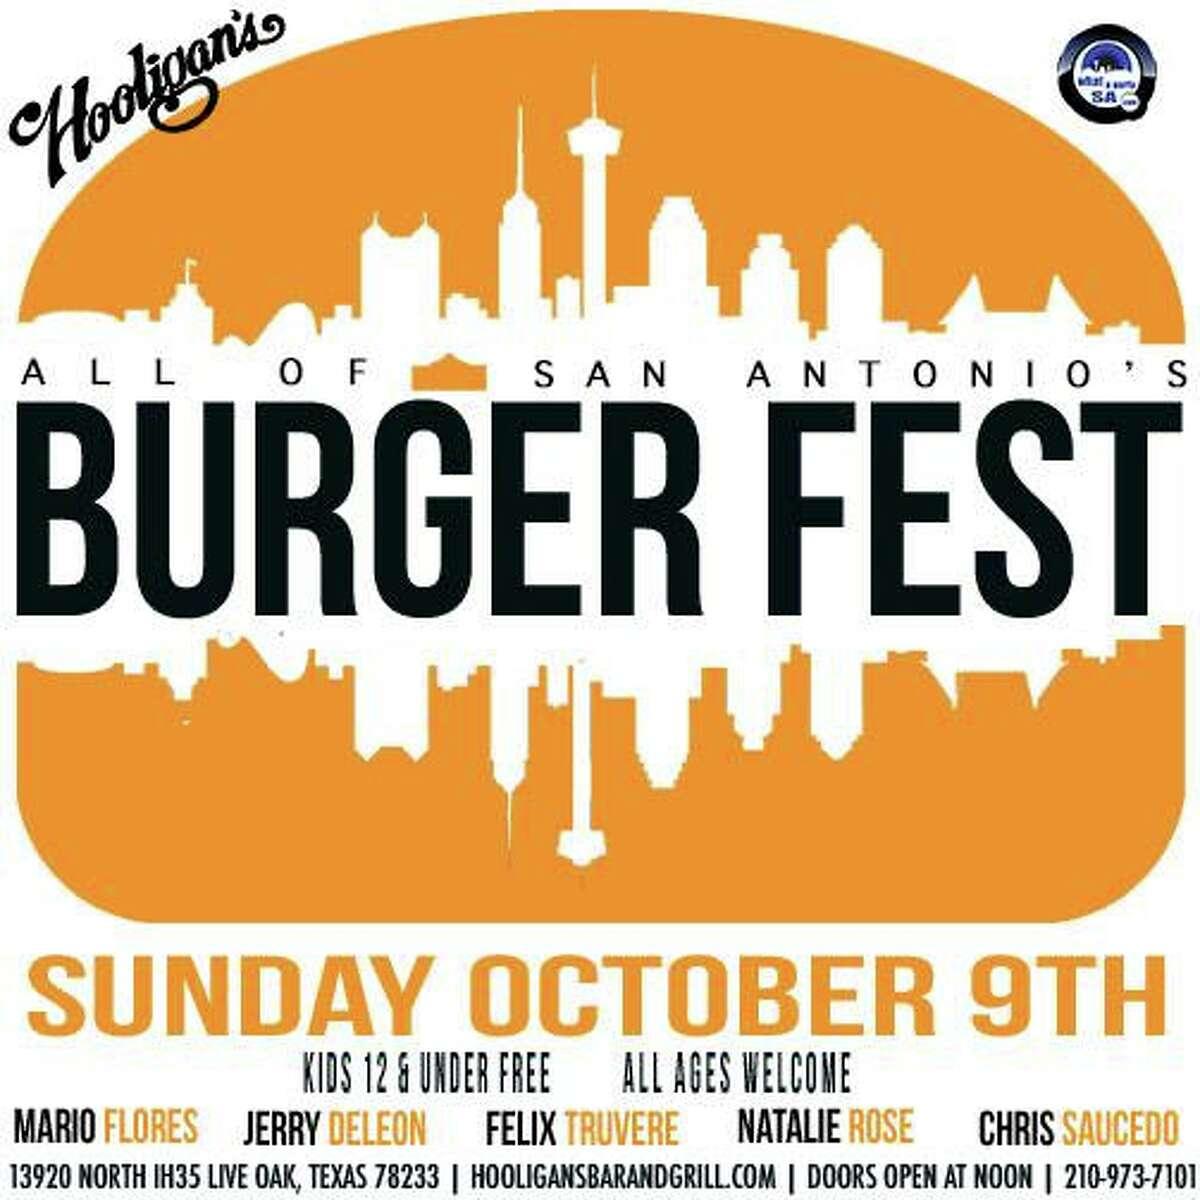 "DJ TonyC and WhatAPartySA will host ""All of San Antonio's Burger Fest"" at Hooligan's Bar anf Grill on Oct. 9, 2016."